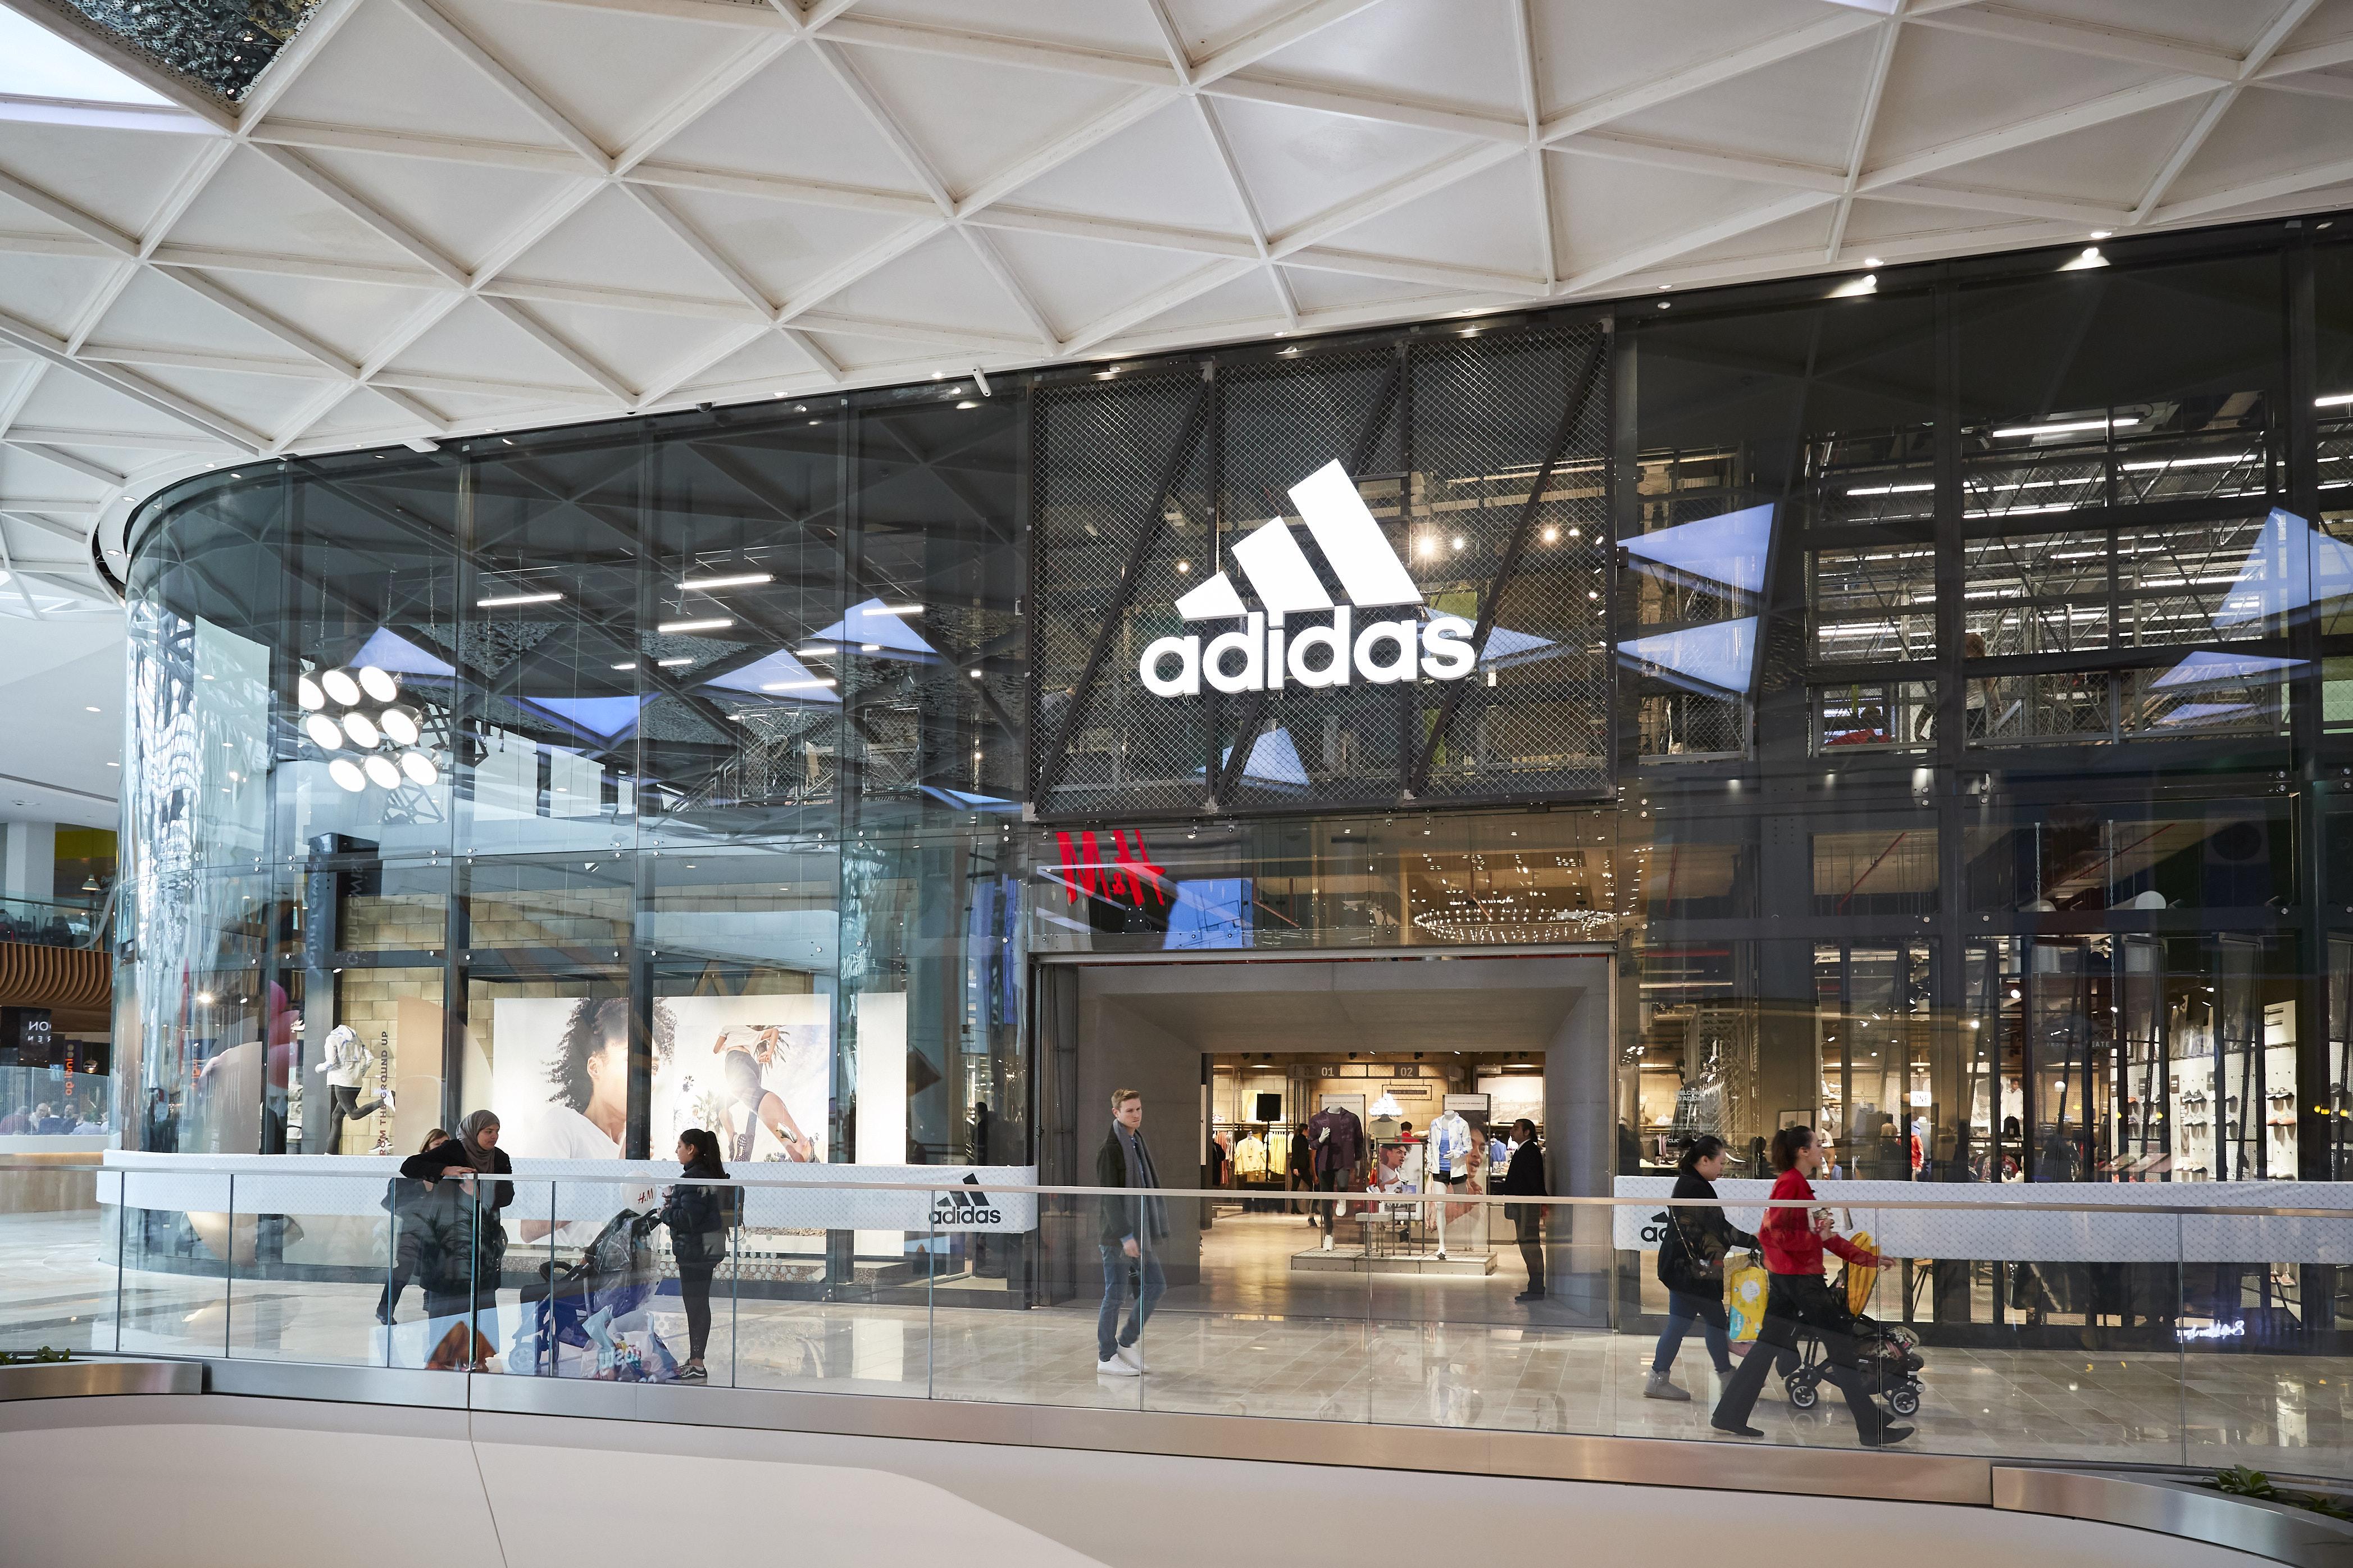 pestillo nacionalismo Desafío  Inside Adidas's Westfield London 'stadium' store